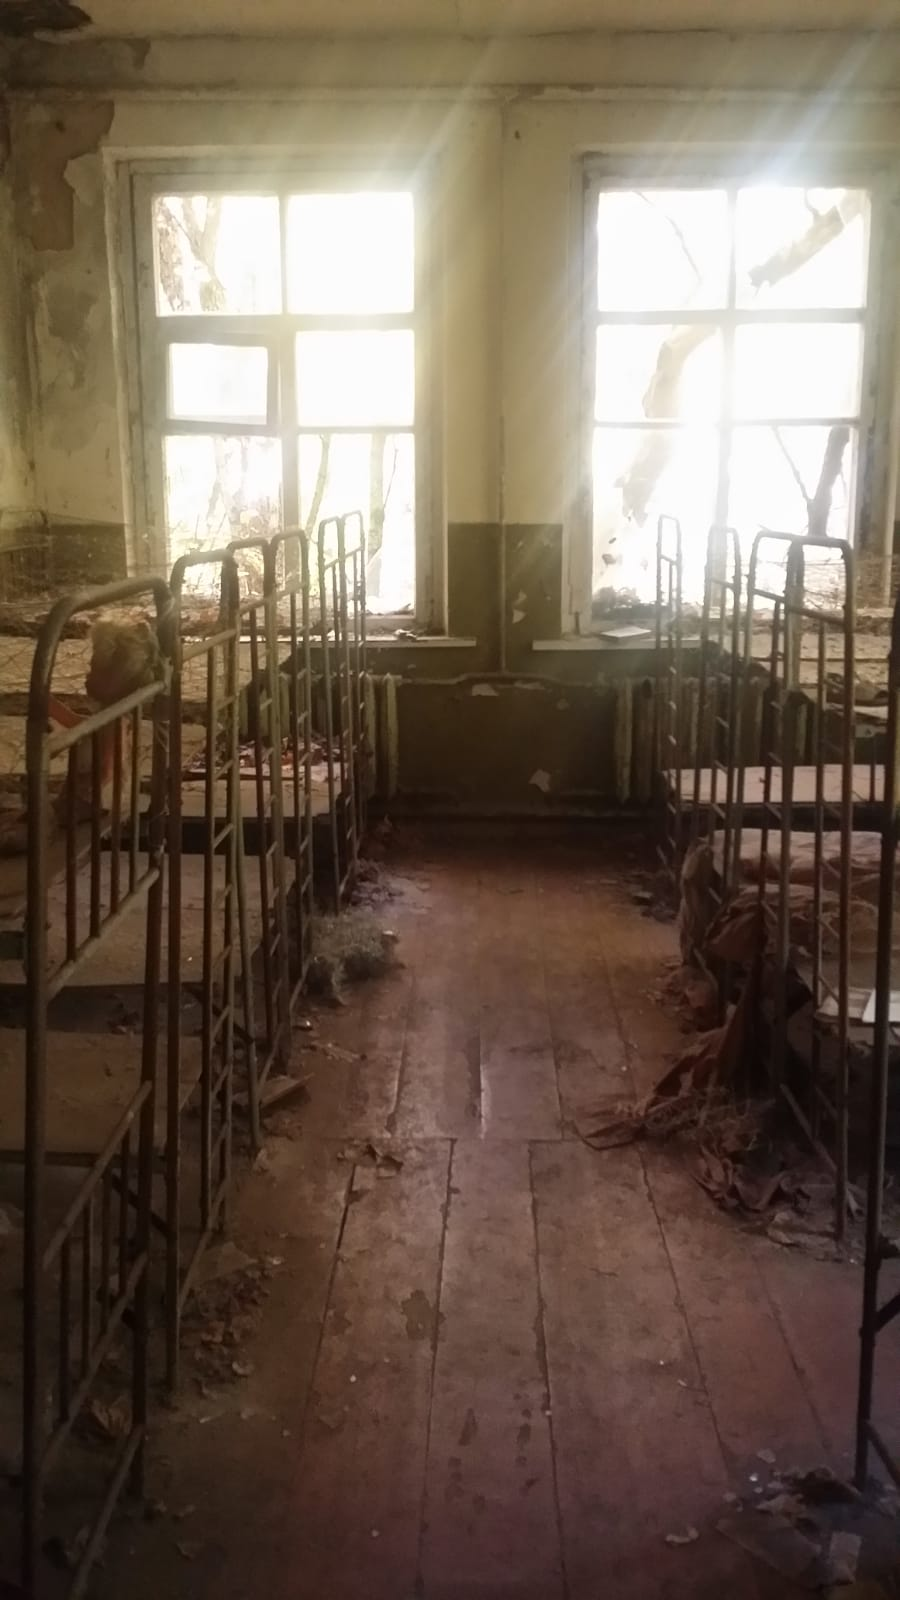 escuela 2 chernobyl.jpeg